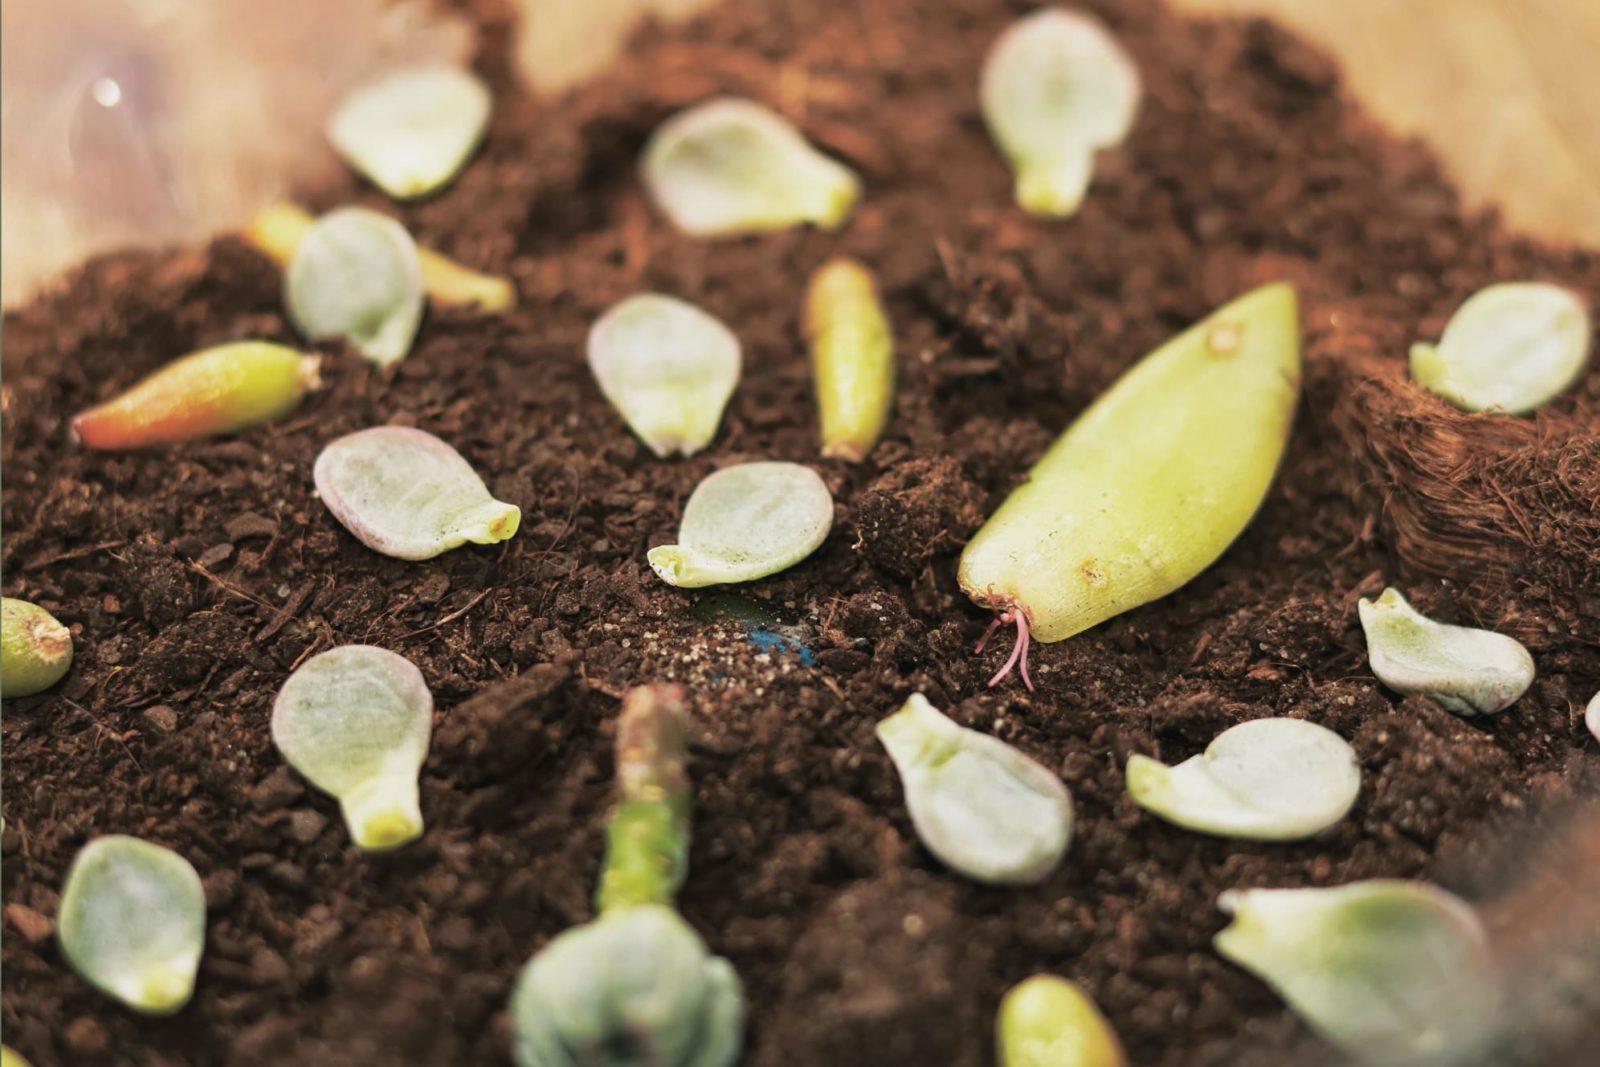 succulent cuttings sat on soil